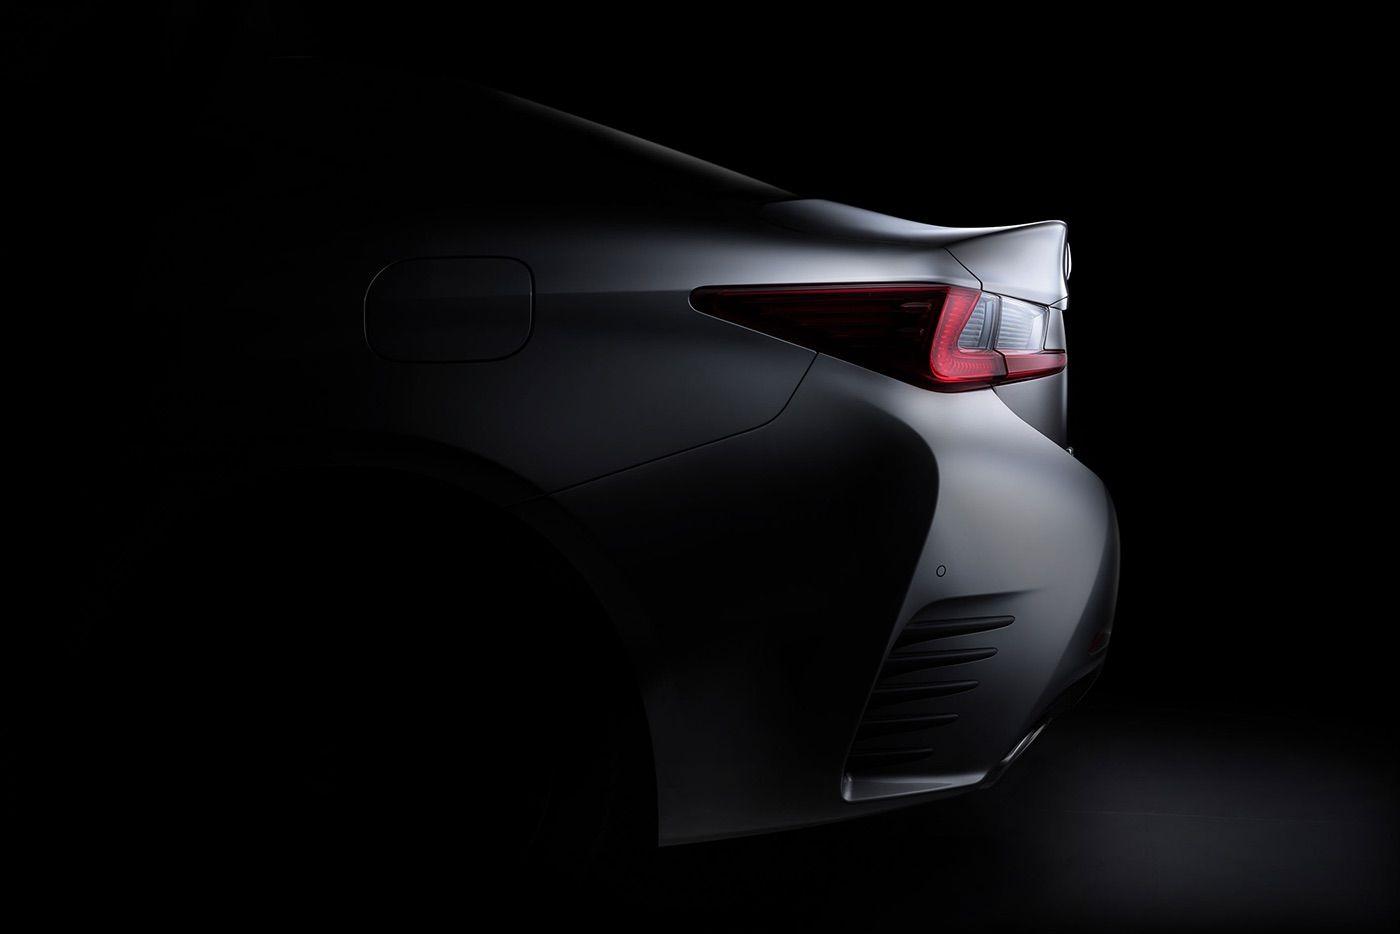 Lexus Rc 350 F Sport Fine Art Photography On Behance Fine Art Photography Art Photography Fine Art 2018 lexus rc 350 f sport black